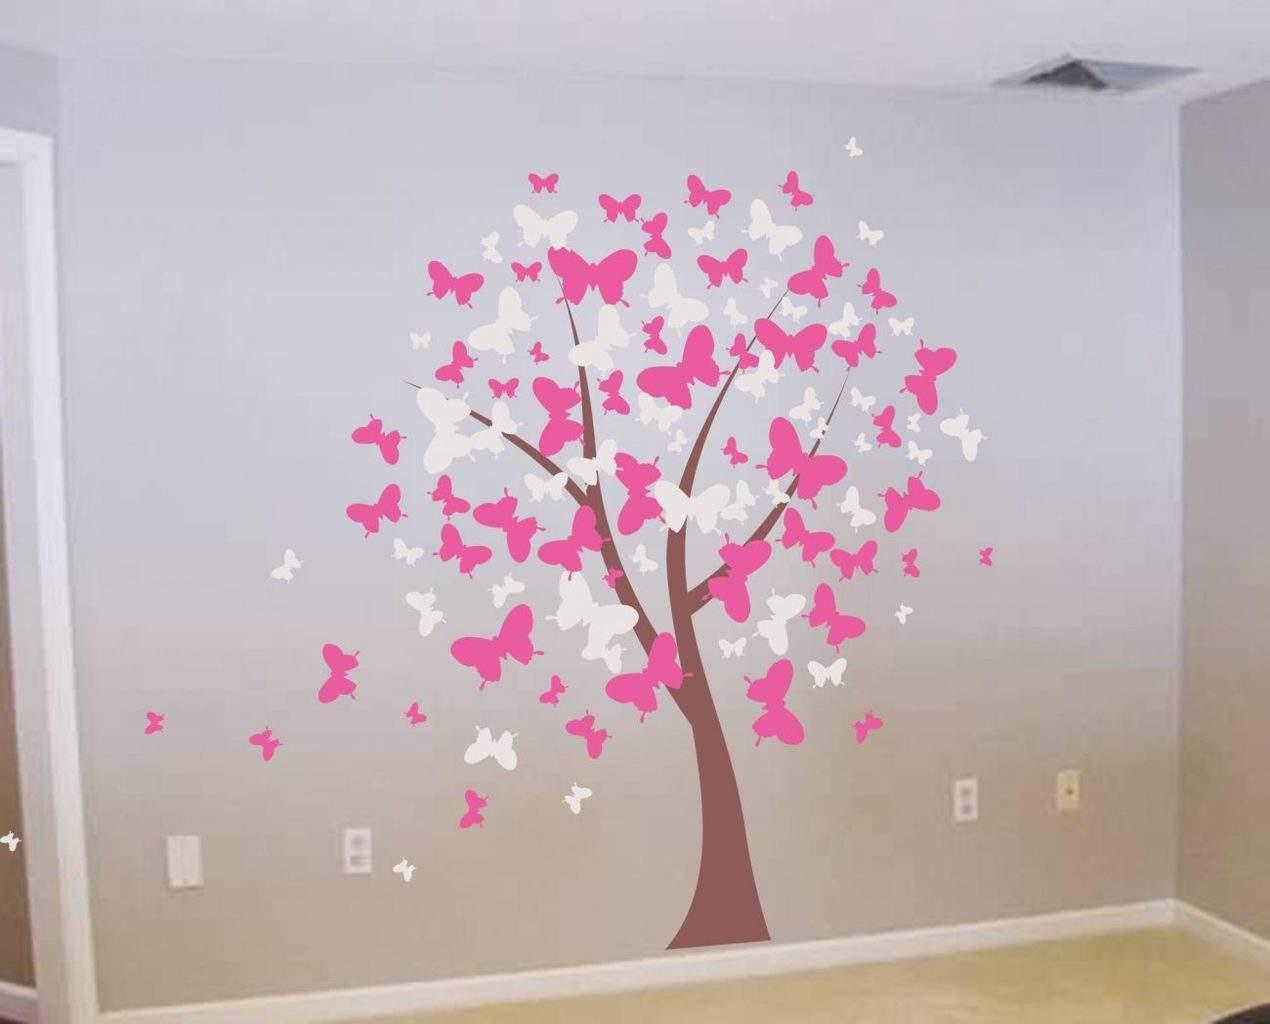 Butterfly tree wall decal sticker